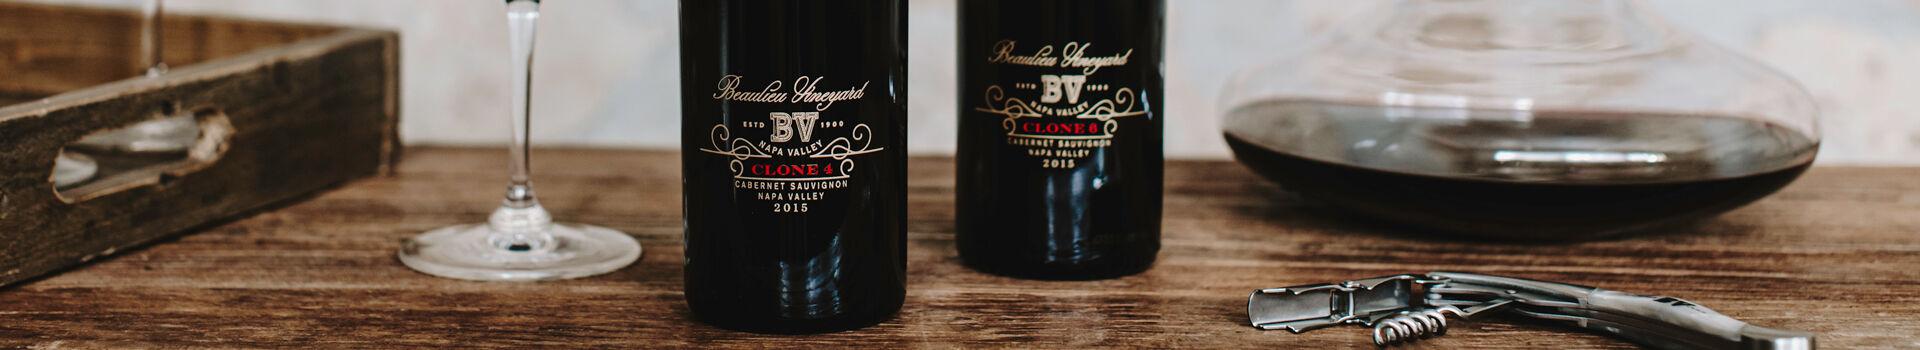 Beaulieu Vineyard (BV) Clone 4 and Clone 6 Cabernet Sauvignon